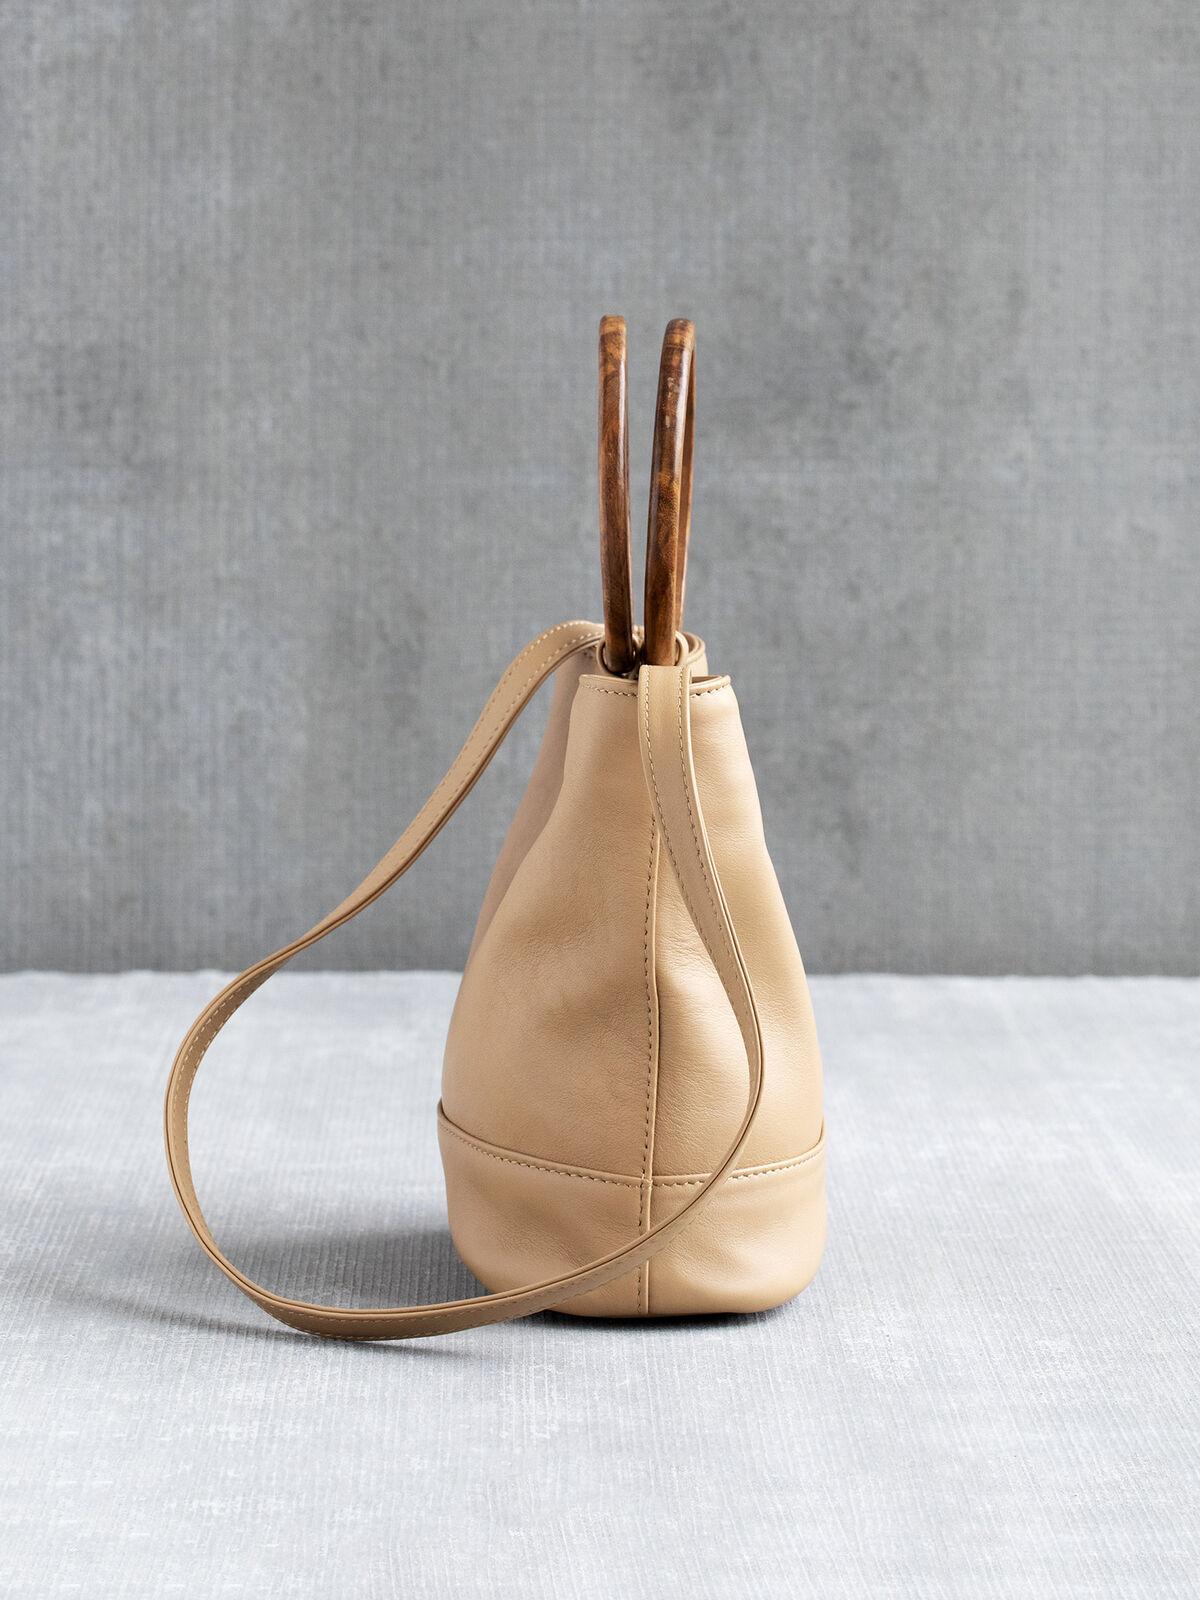 Payton James Mini Bucket Bag